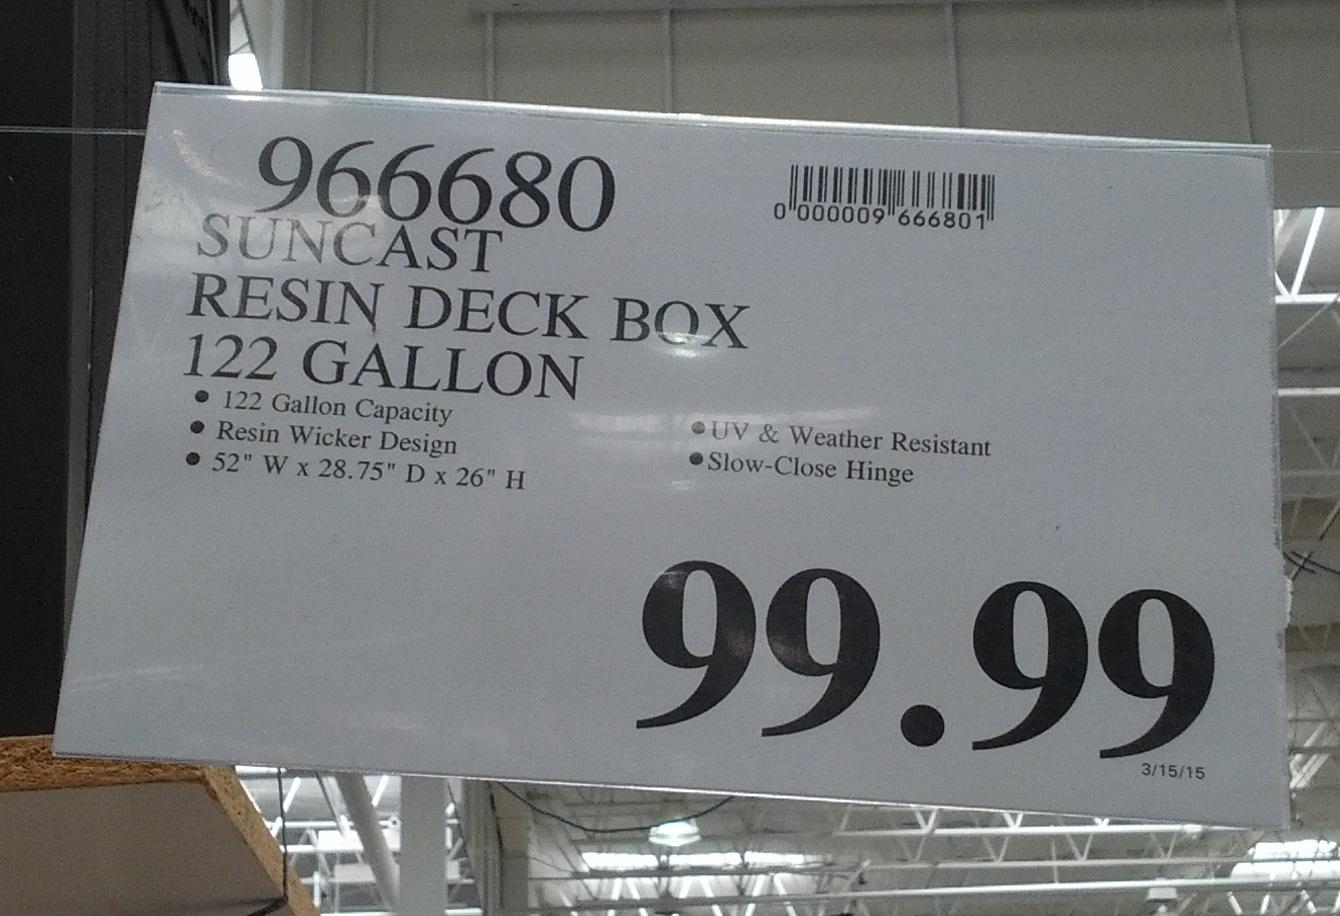 Suncast Resin Extra-Large Deck Box DBW9935 item number 966680 at Costco & Suncast Resin Extra-Large Deck Box DBW9935 | Costco Weekender